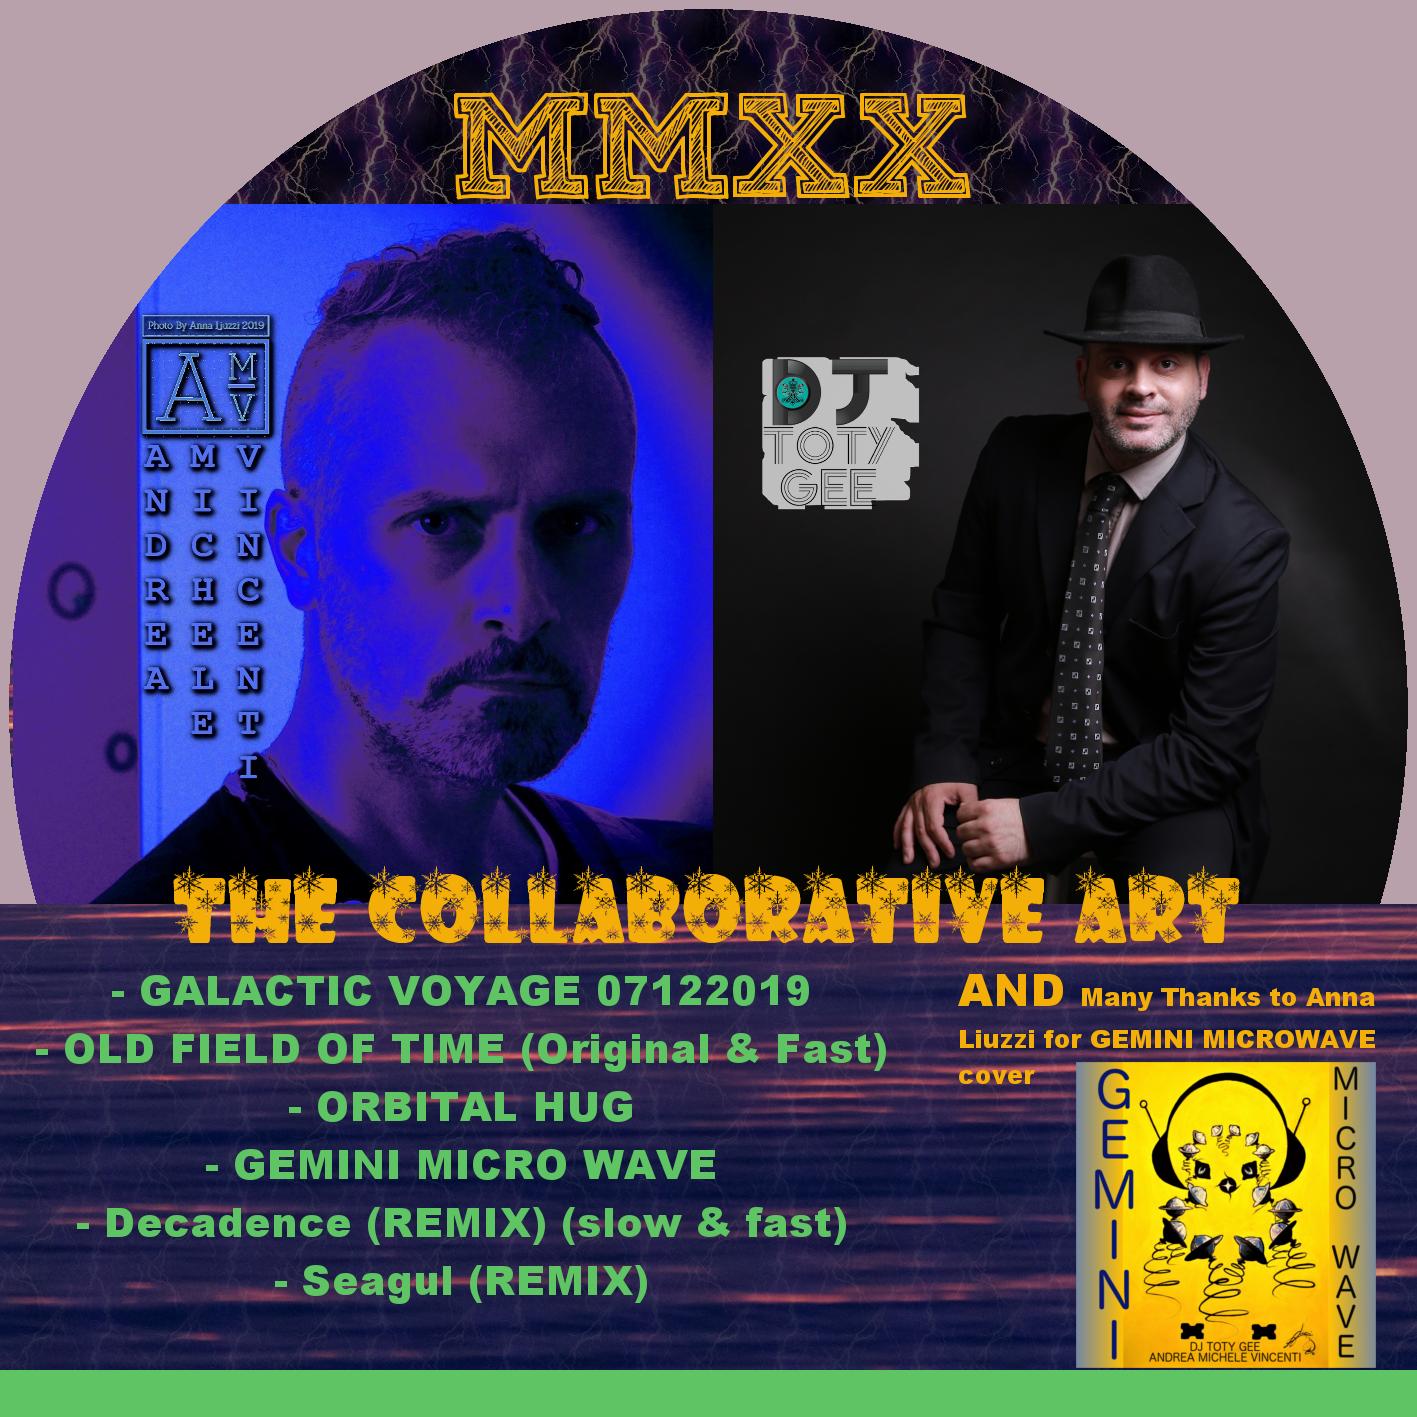 MMXX THE COLLABORATIVE ART (Album)